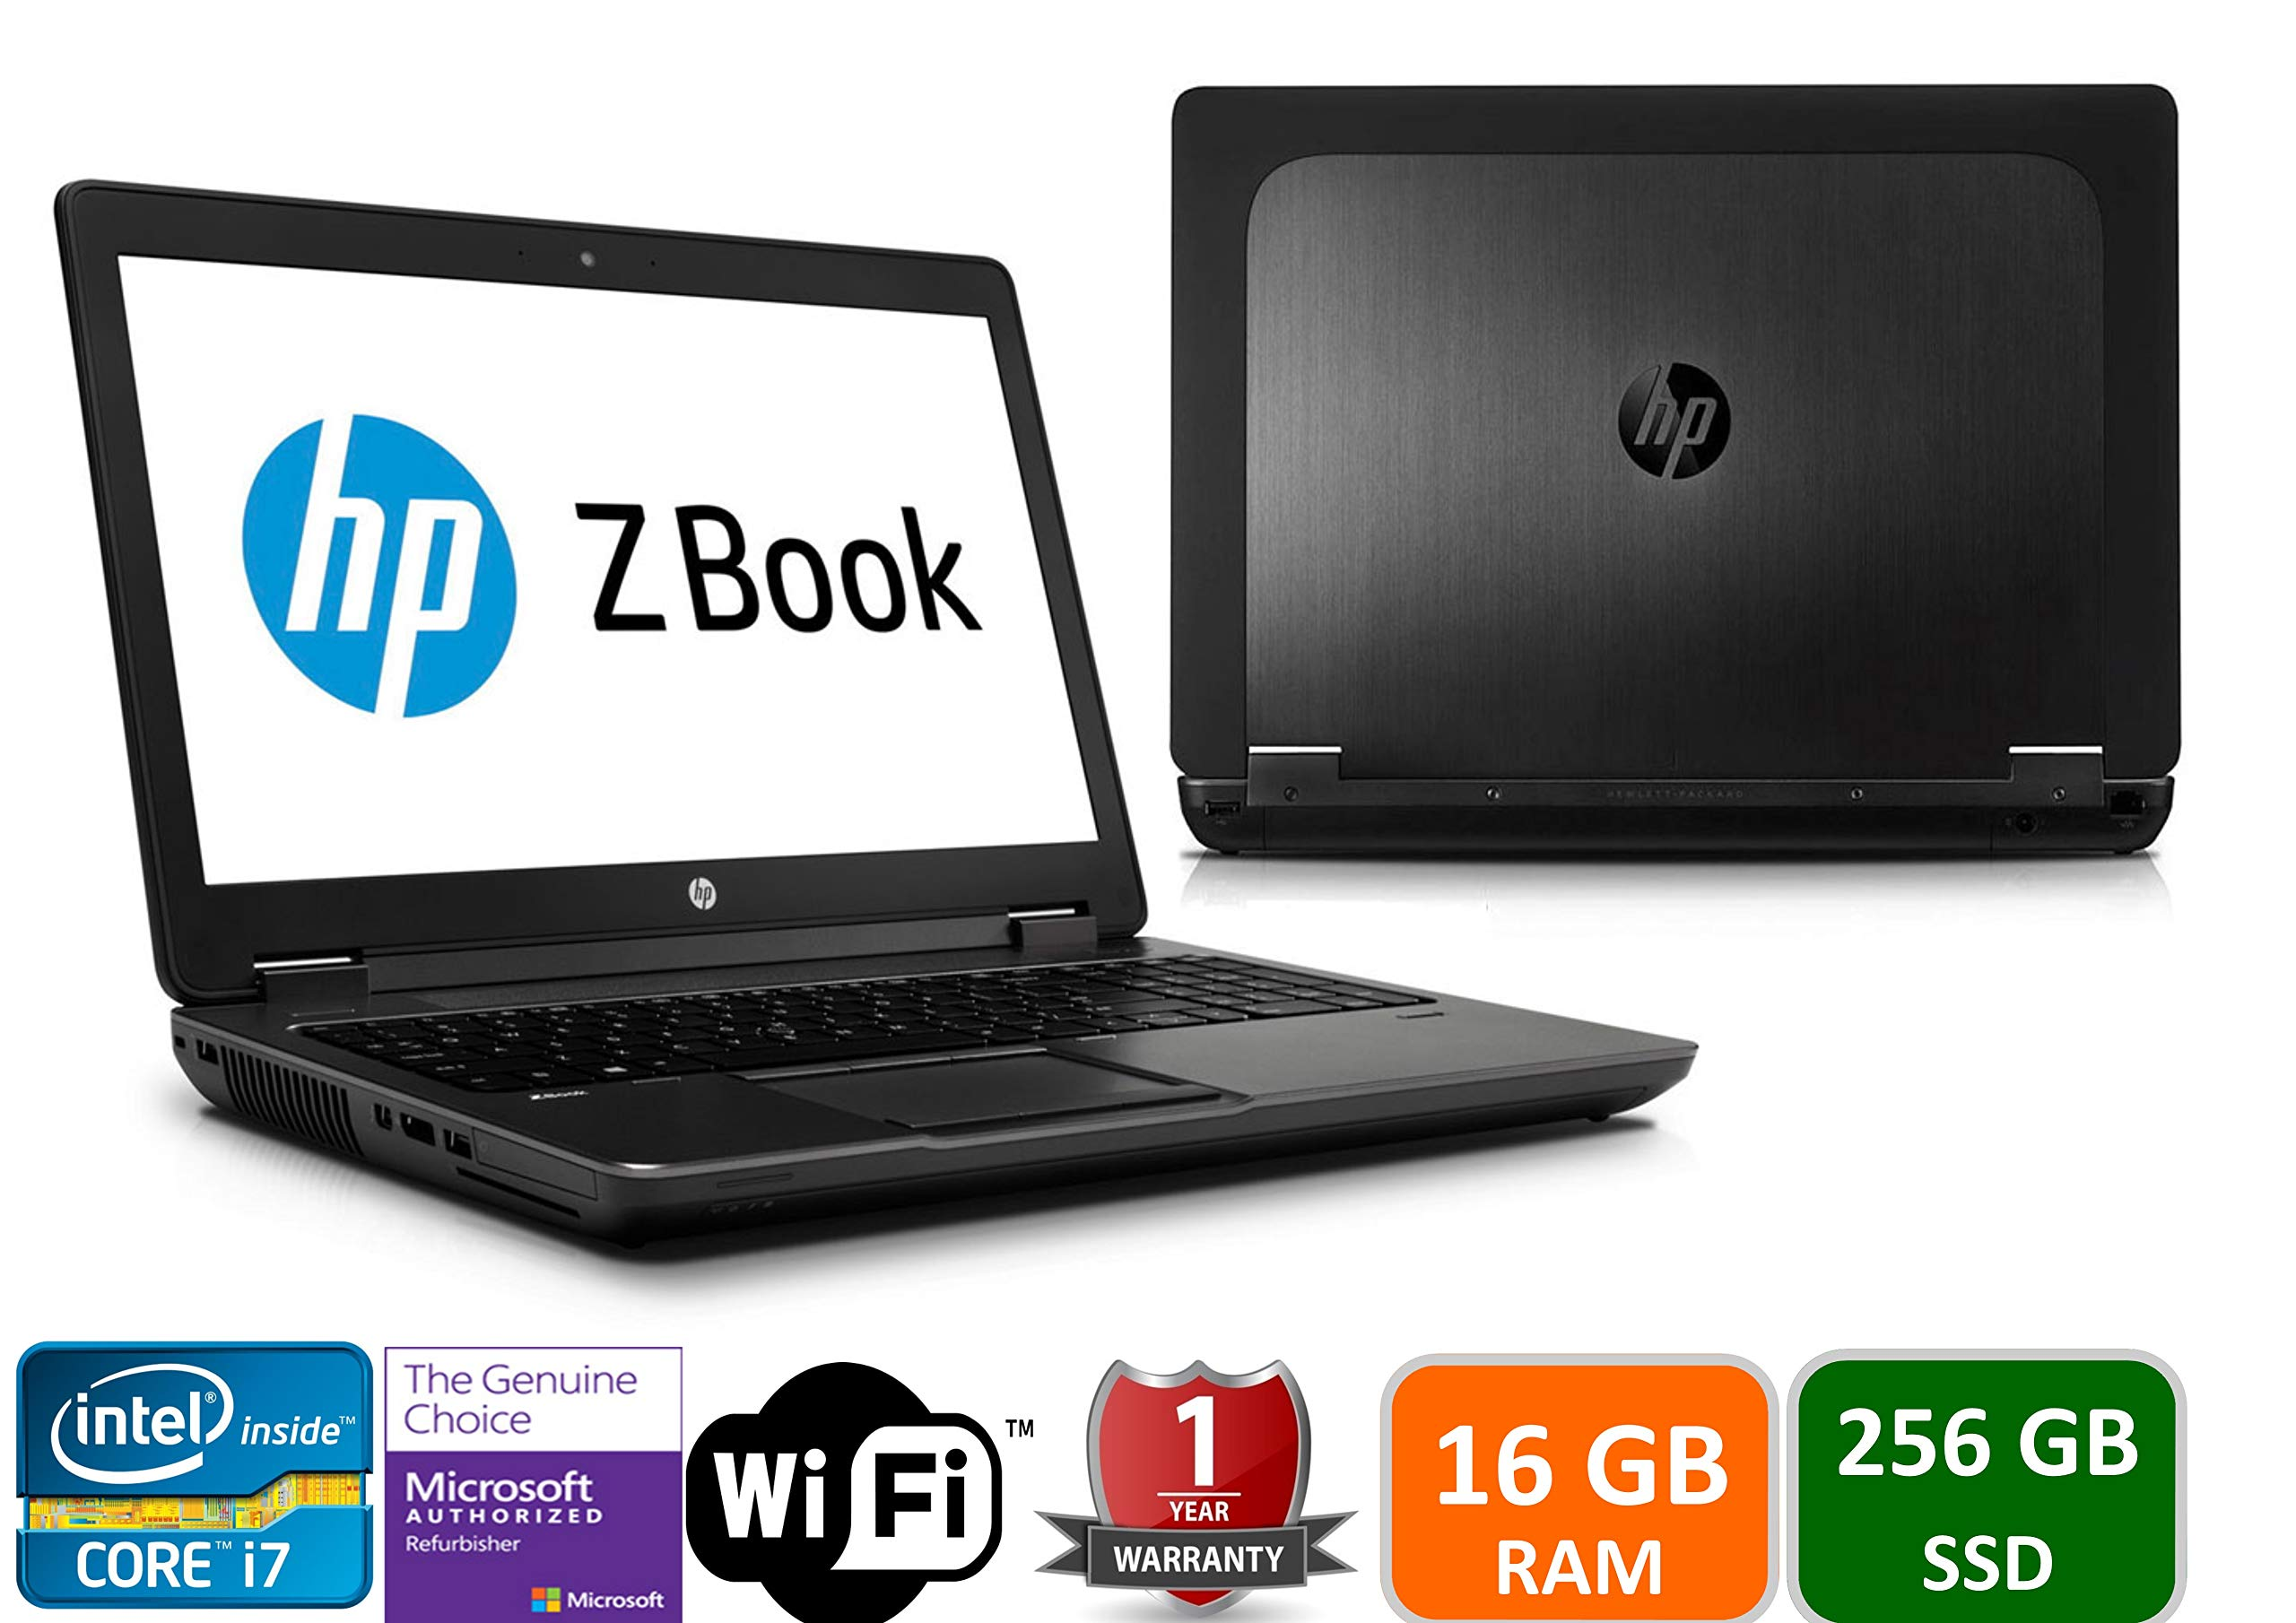 HP Zbook 15 Intel i7-4800HQ, 16GB Memory, 256GBSSD, 15.6in Screen, 1920x1080, Win 10 Pro(Renewed)